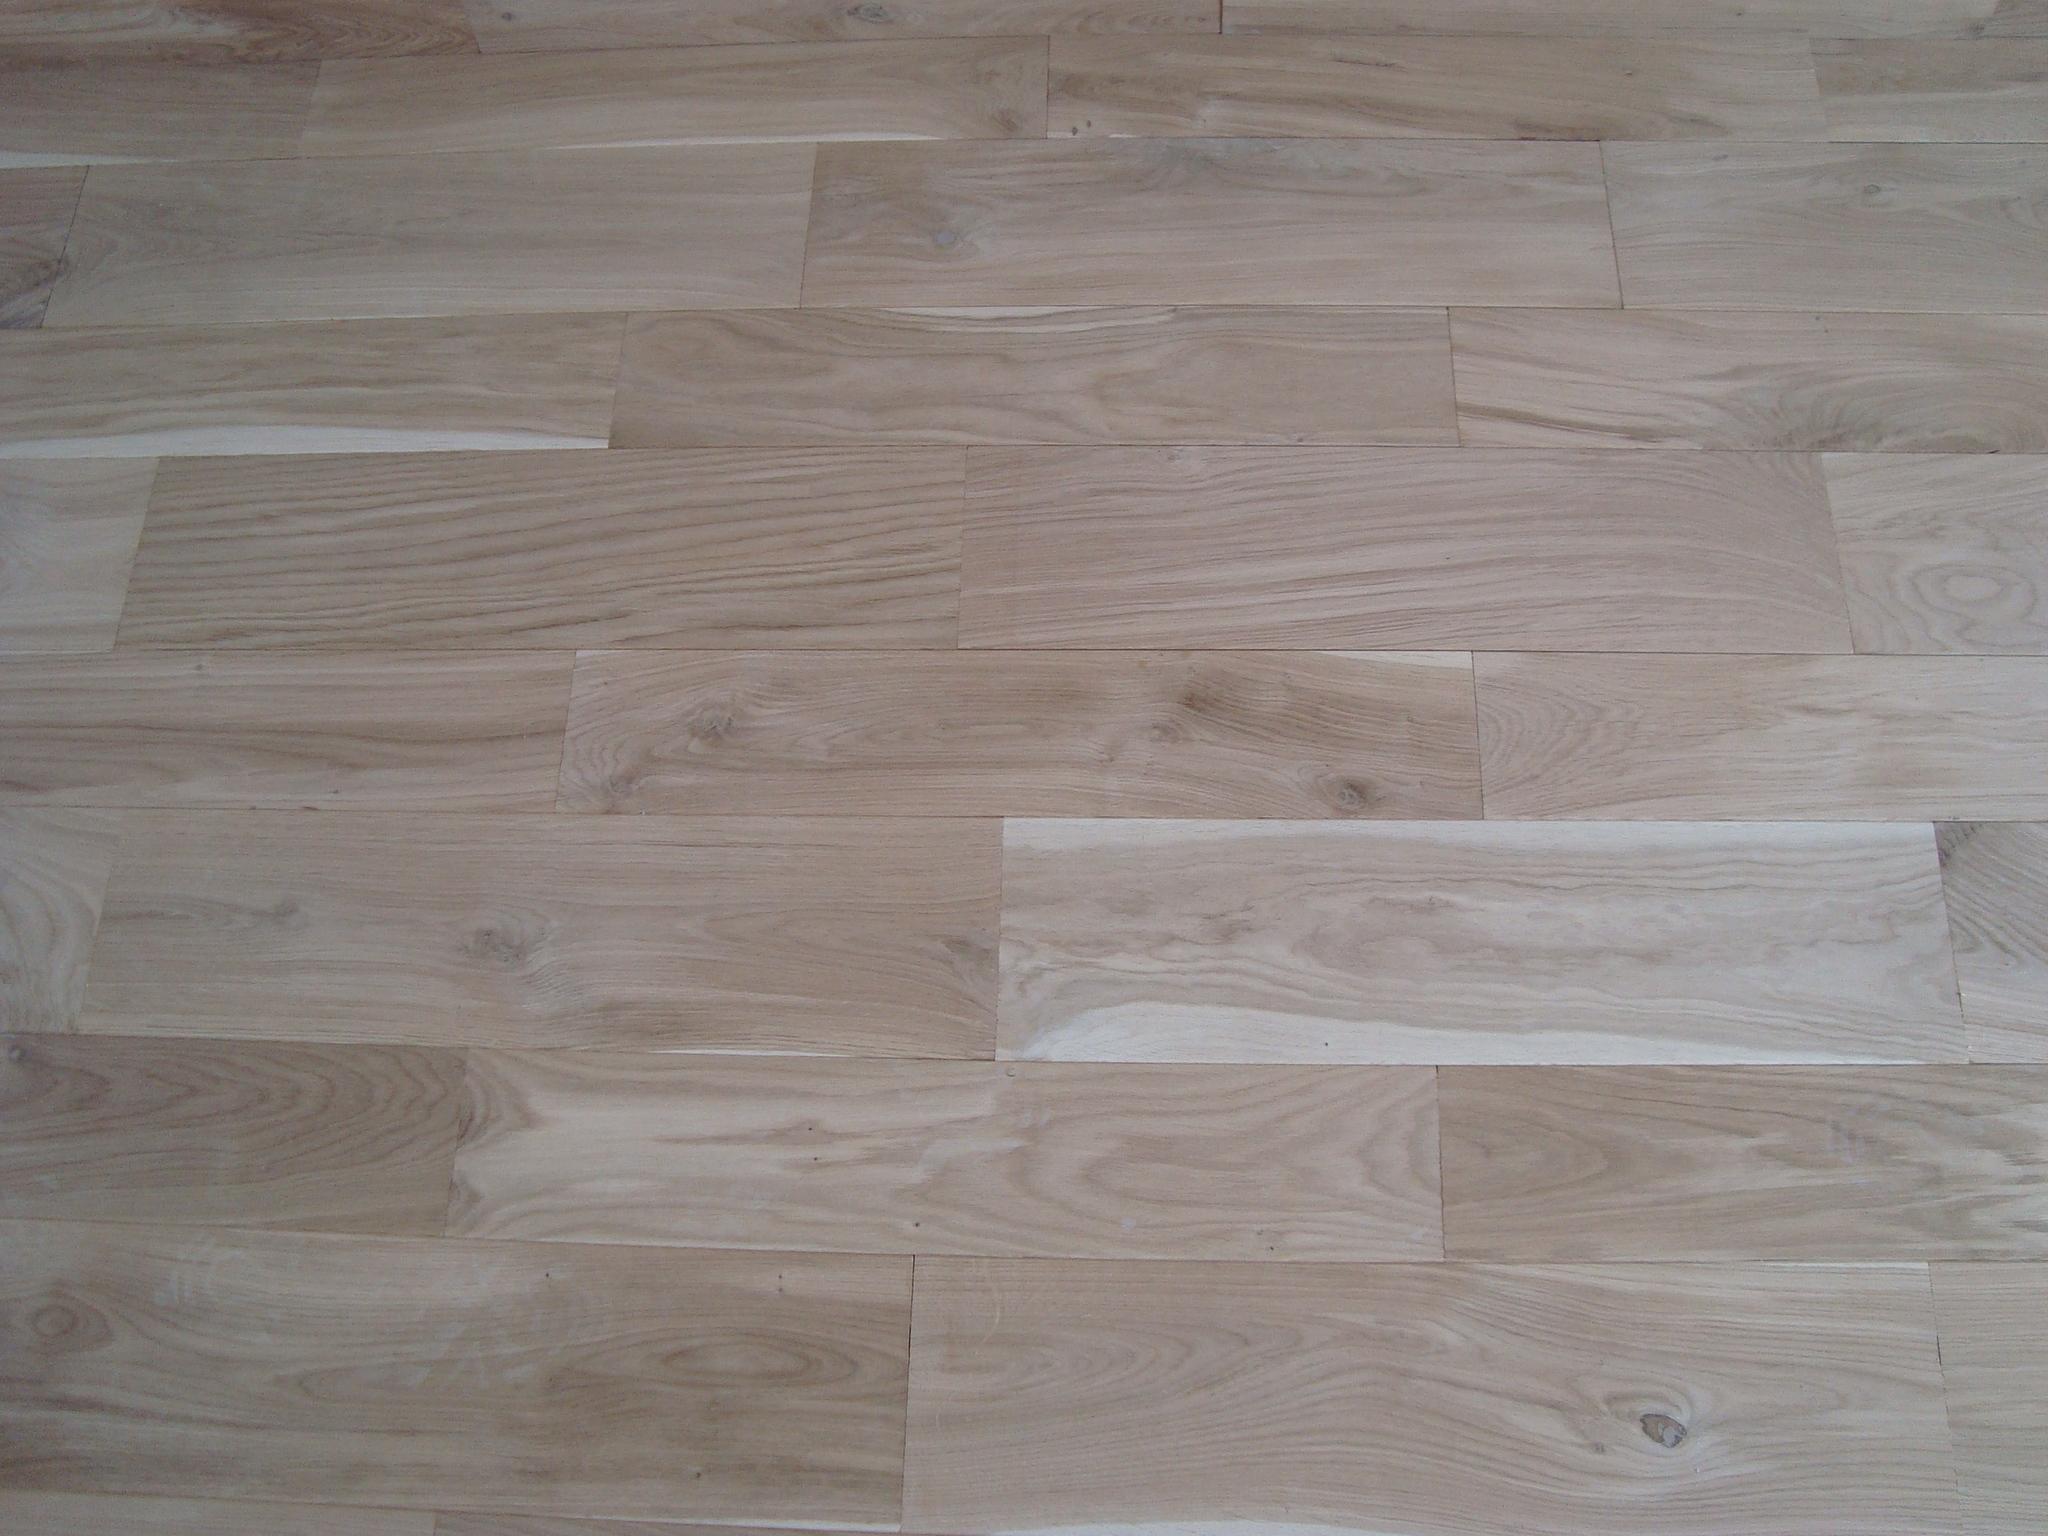 "Massiivpõrand tamm,"" Lühike Natur-Rustik"" 1MP10 | Solid wood flooring Oak Natur Rustic Short2"